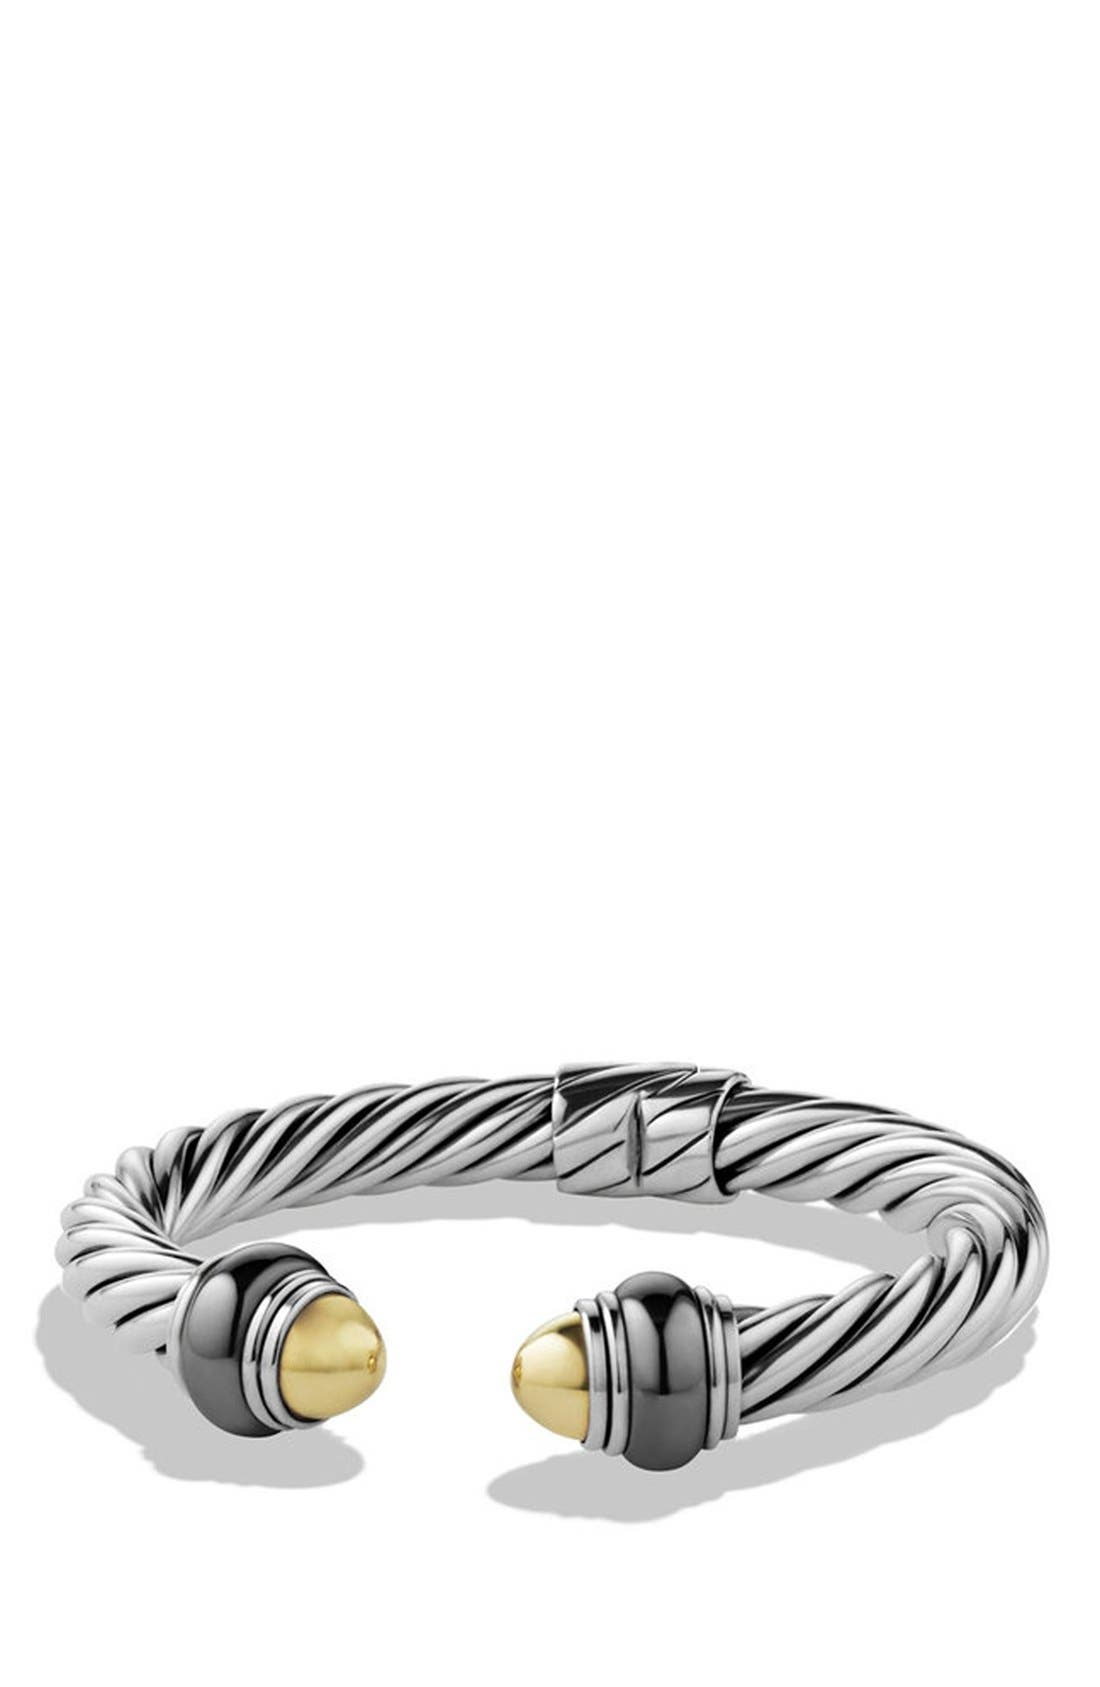 Alternate Image 1 Selected - David Yurman 'Cable Classics' Bracelet